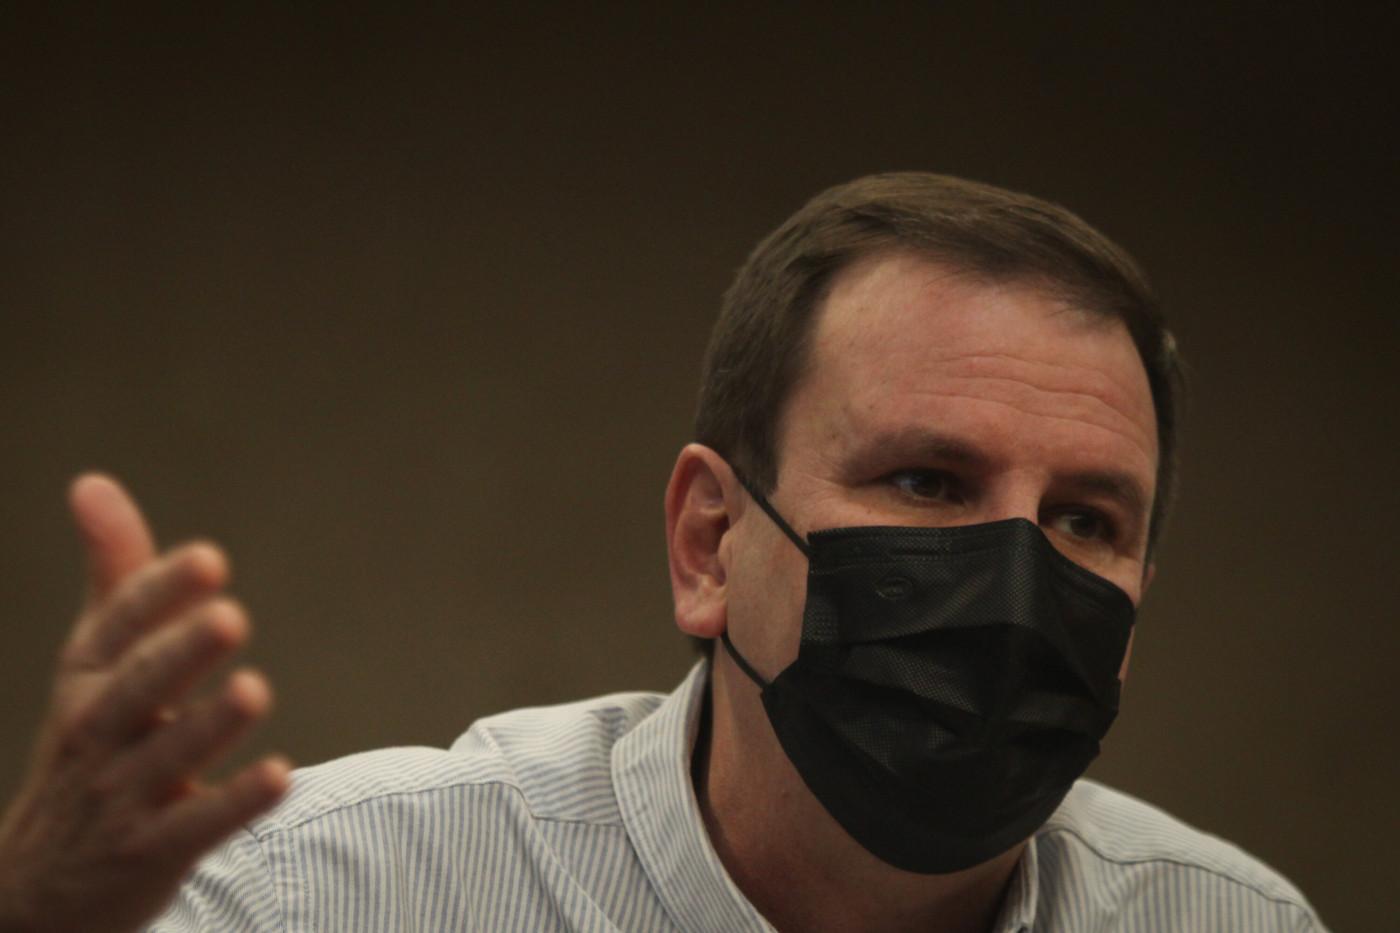 Prefeito Eduardo Paes usa máscara preta e camisa branca